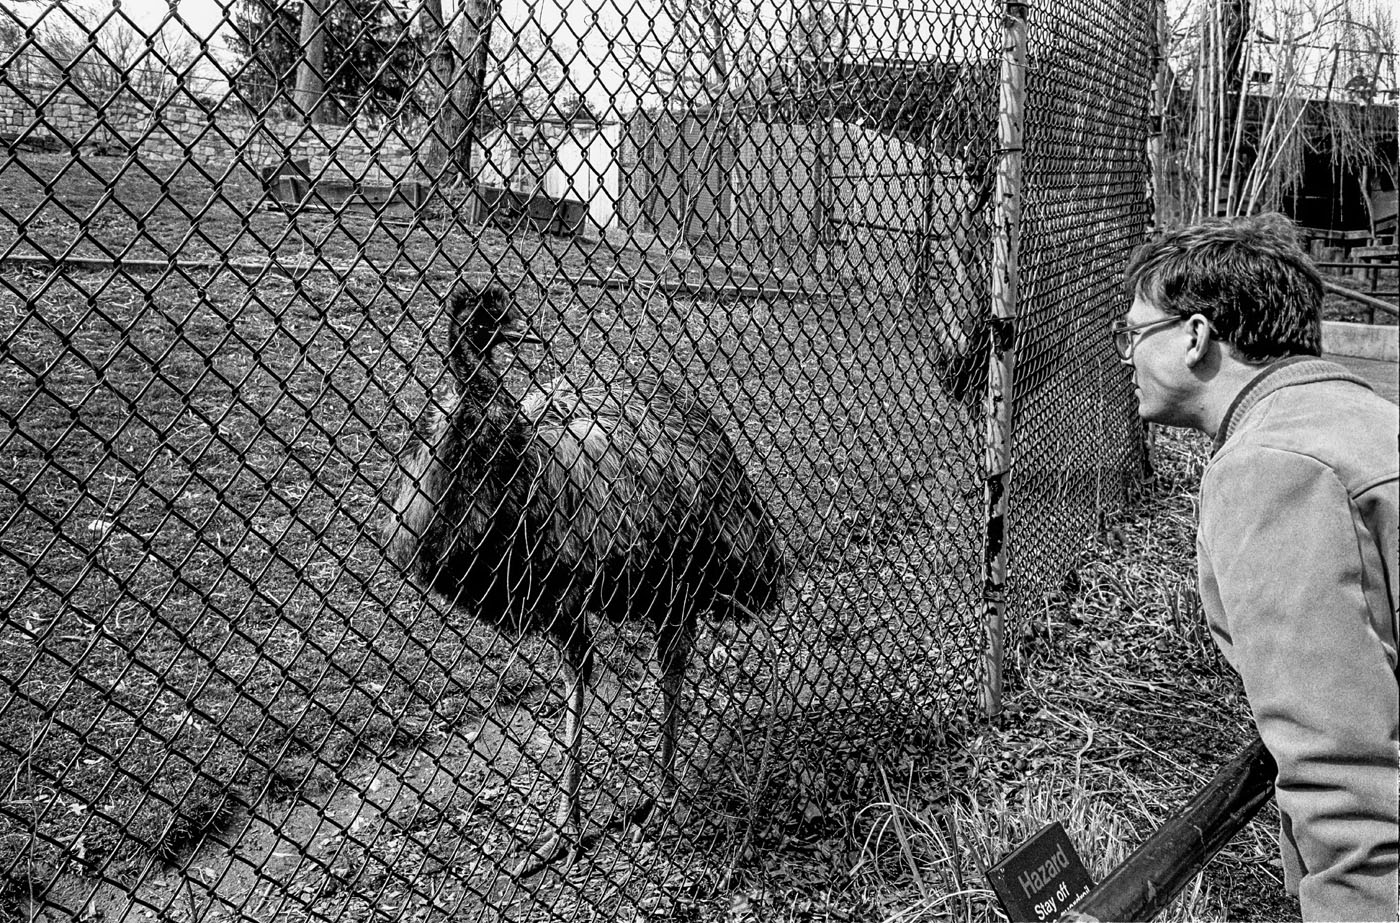 Emu, National Zoo, Washington, DC